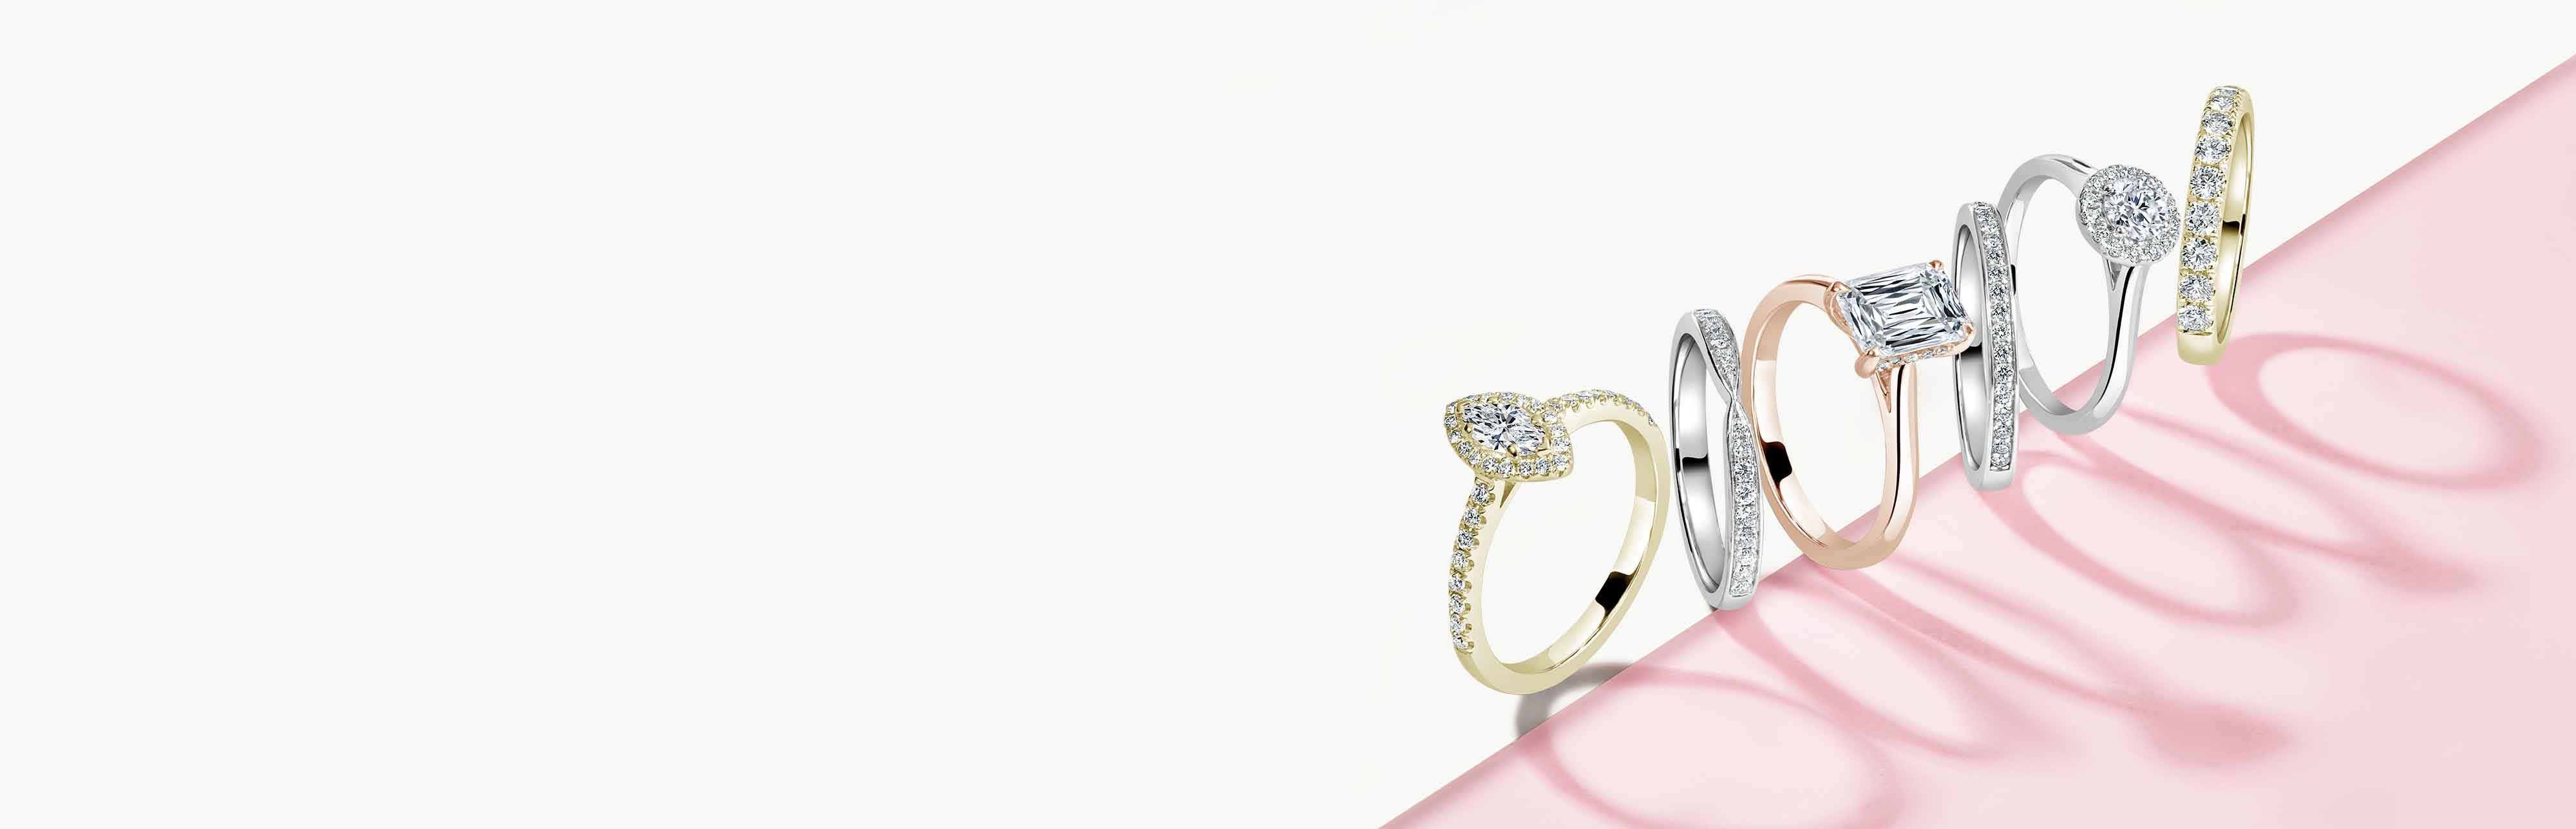 Princess Cut Halo Engagement Rings